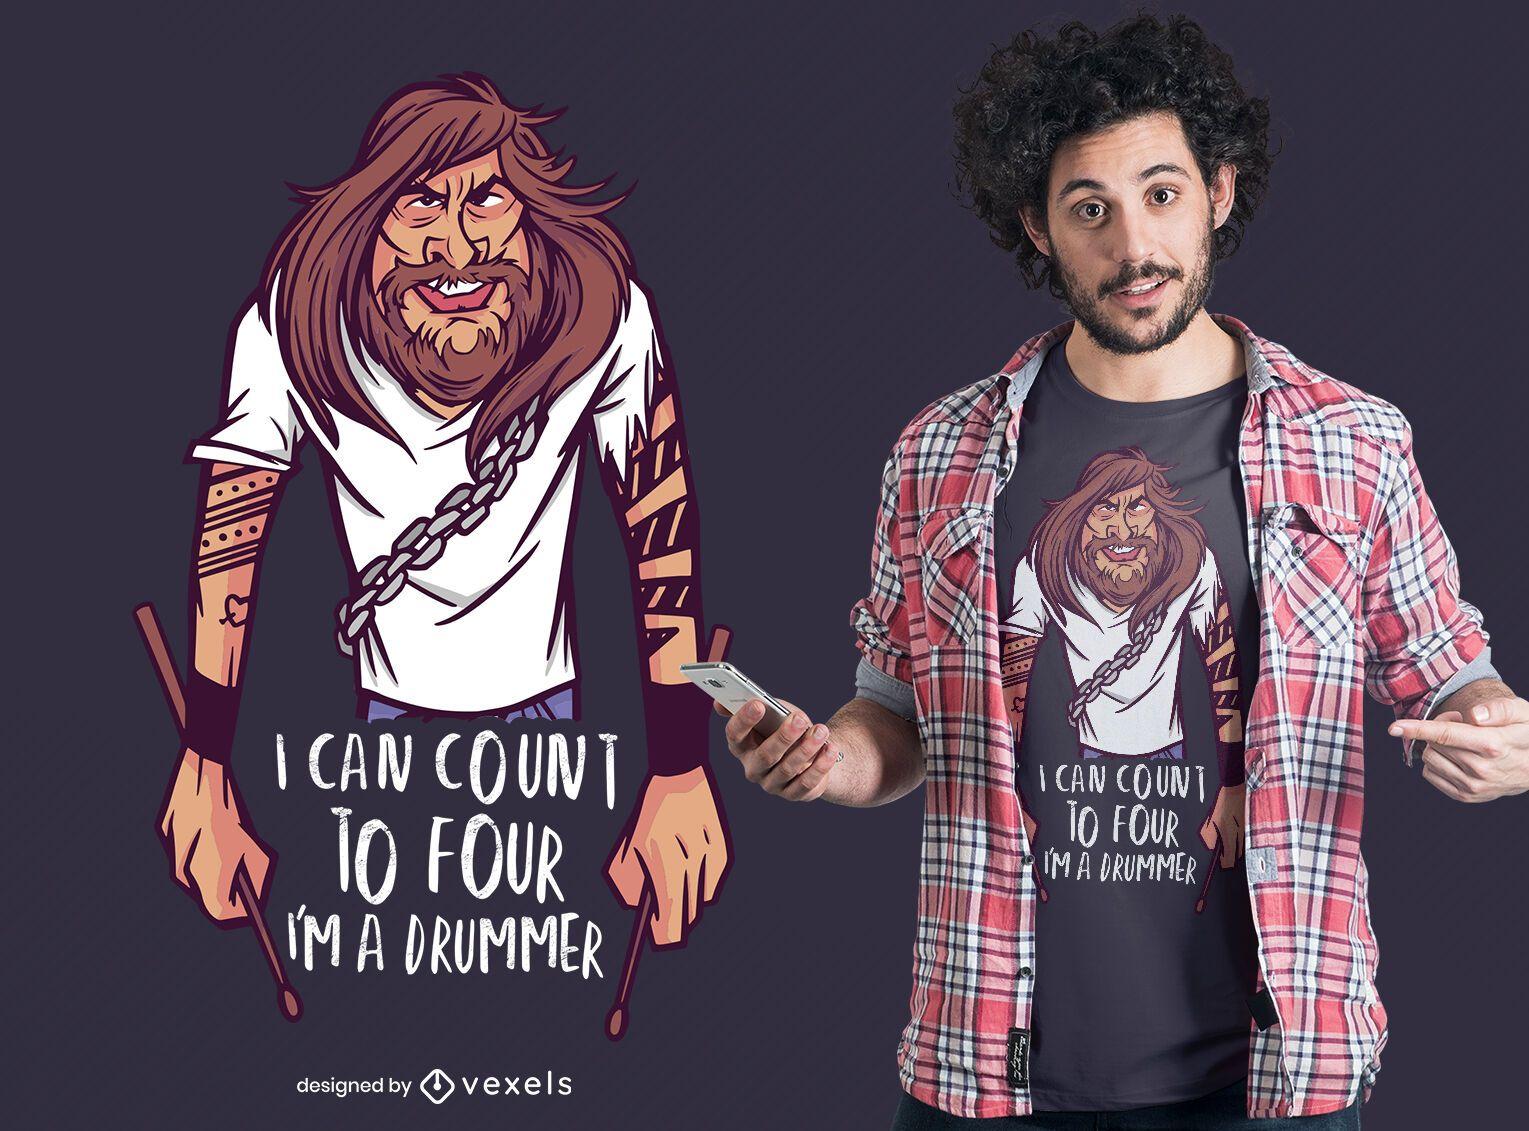 I'm a drummer t-shirt design